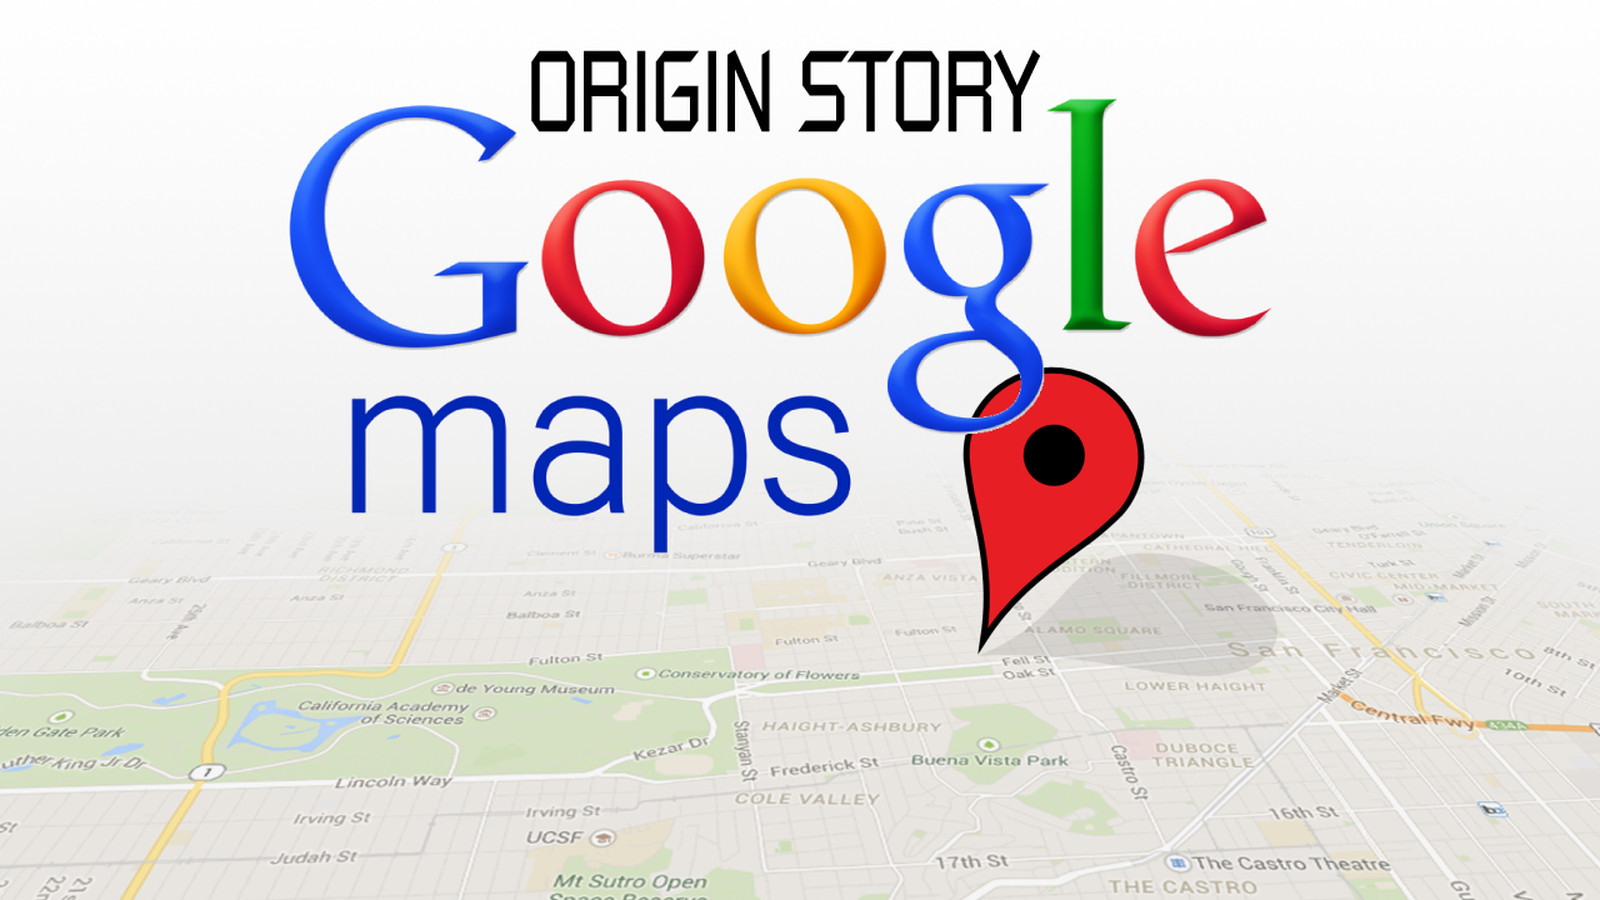 Ten Years of Google Maps, From Slashdot to Ground Truth - Recode